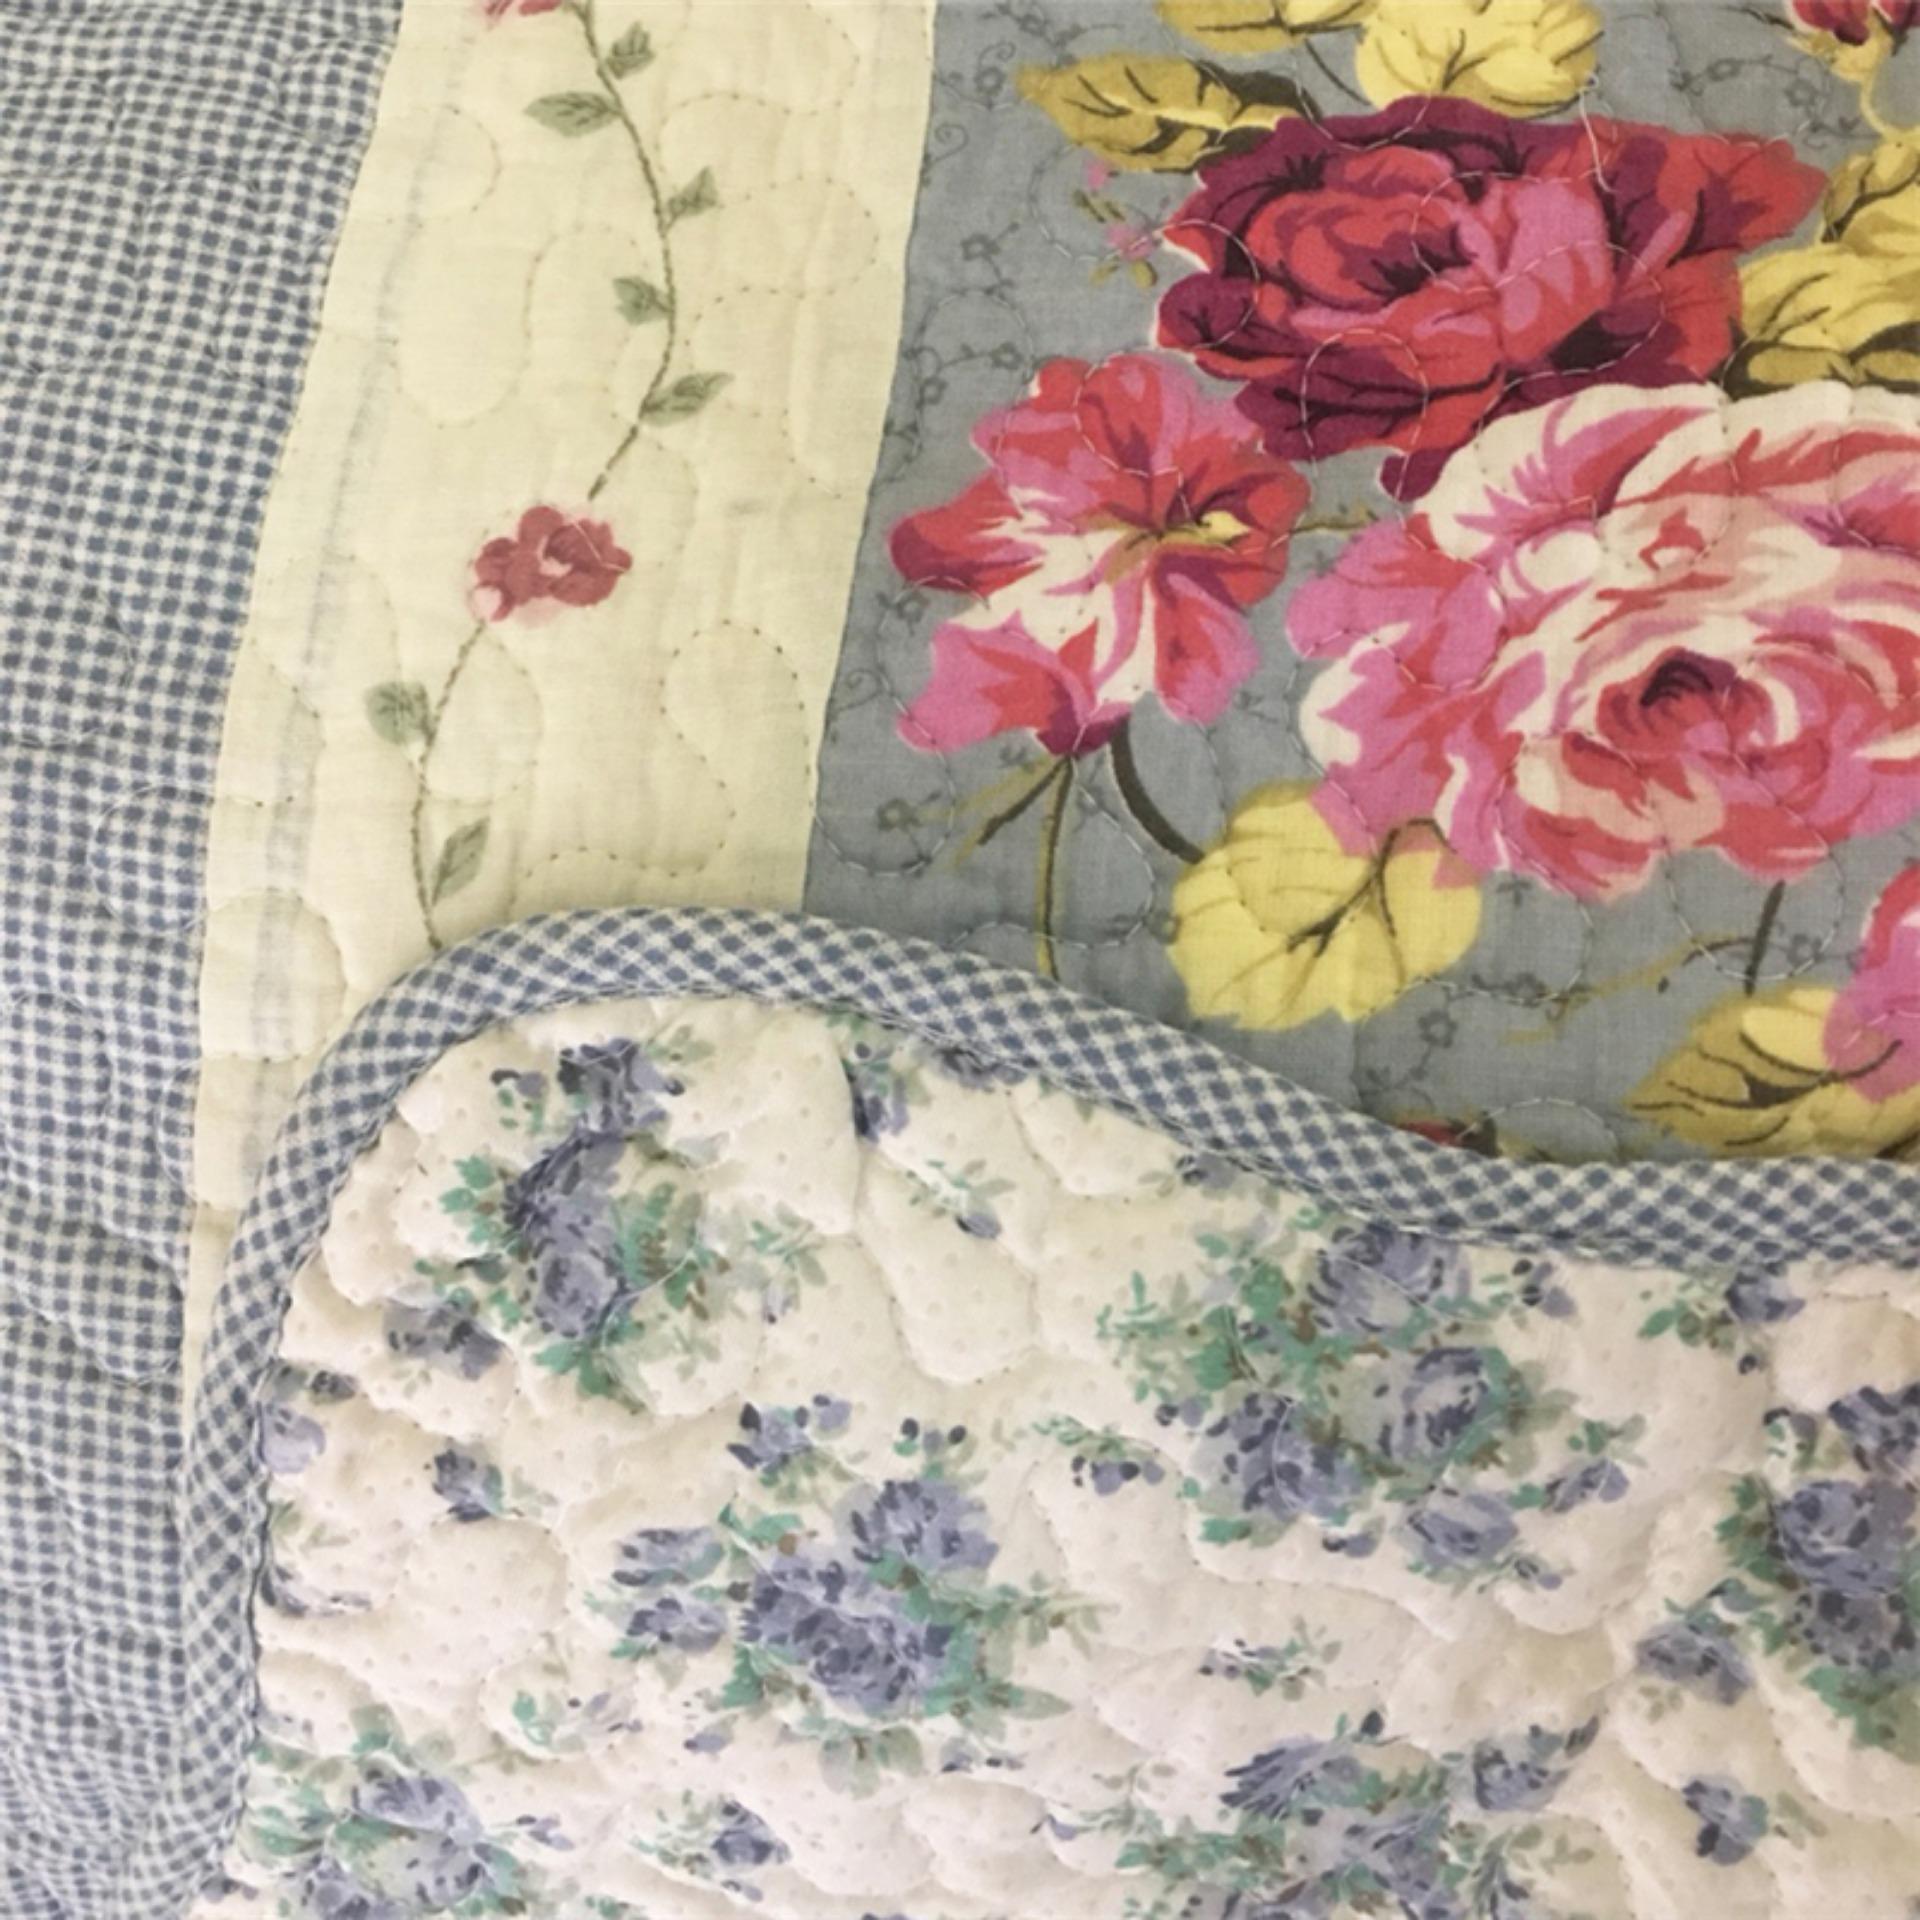 Vintage Story Carpet Floral Biru Motif Bunga Cek Harga Terkini Dan Patchwork 160x210 1 Detail Gambar Shabby Karpet Table Runner Alas Mobil 50x135 Quilting